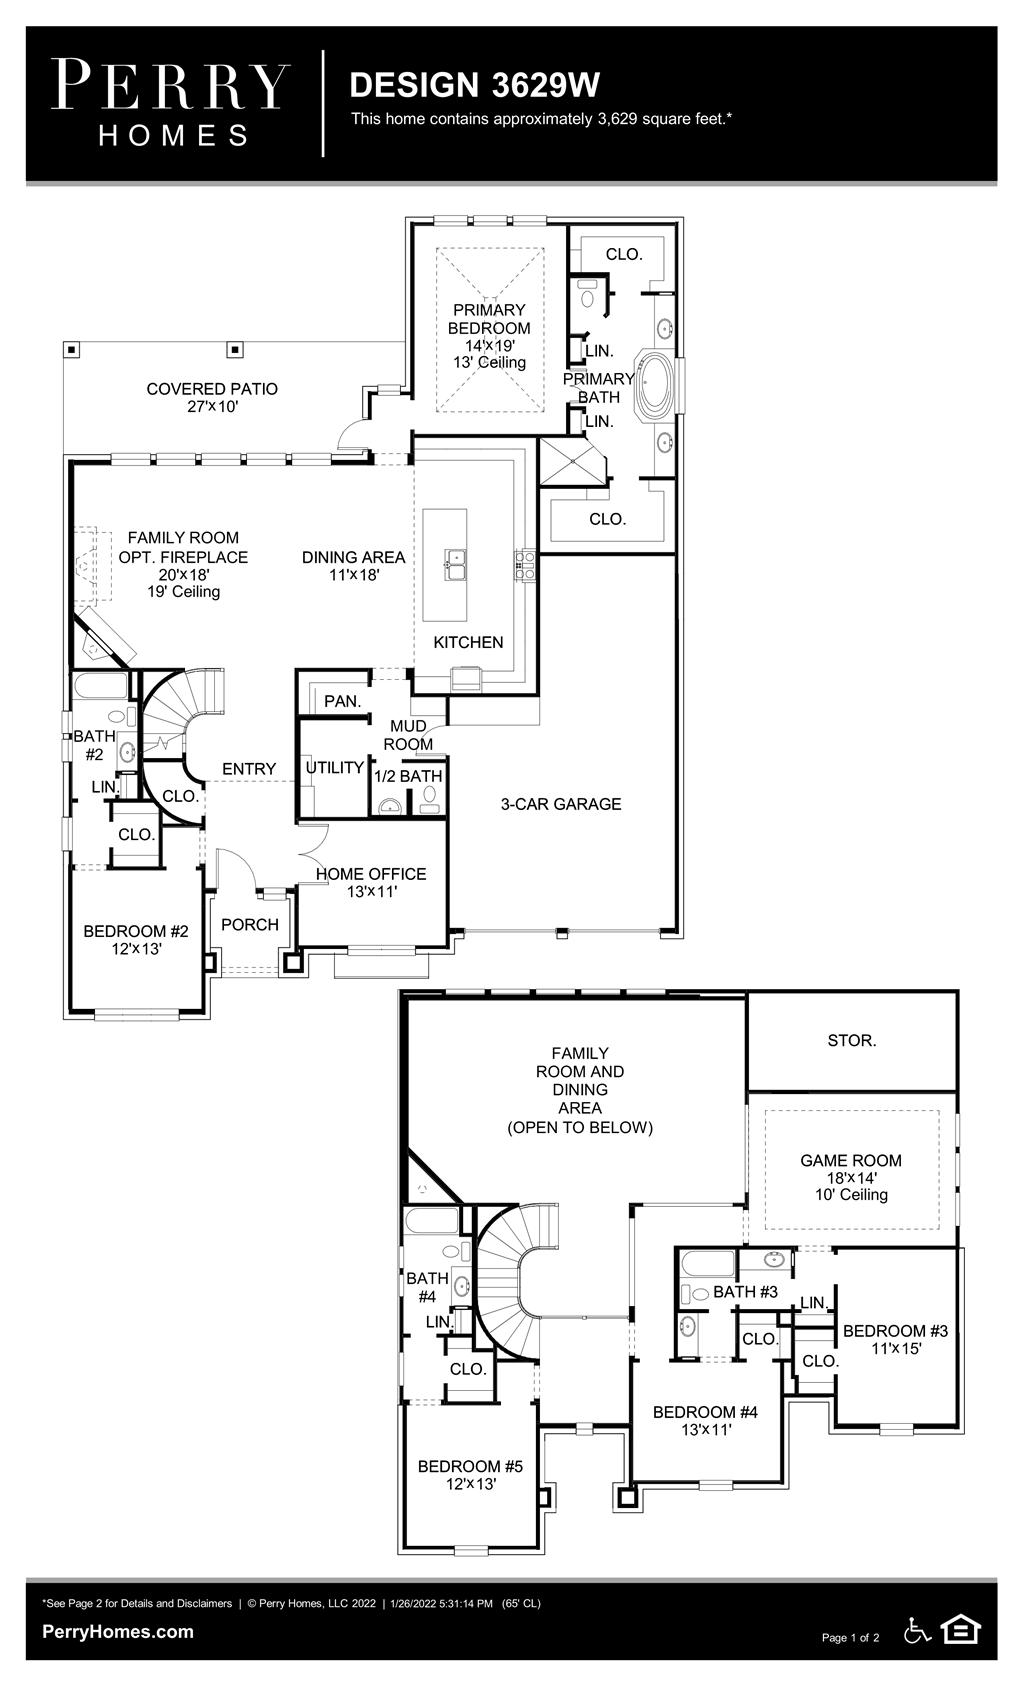 Floor Plan for 3629W